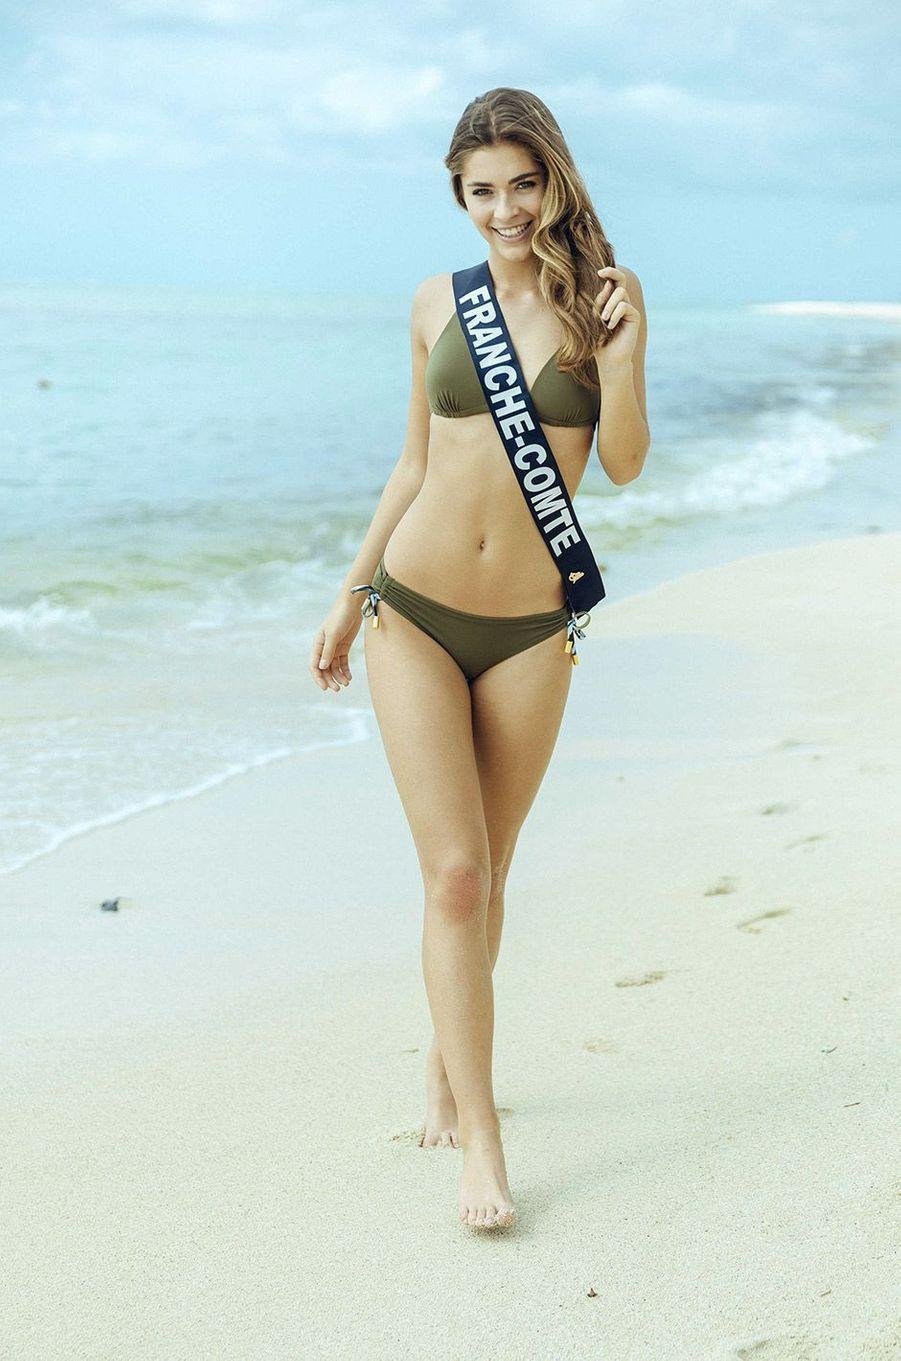 Lauralyne Demesmay,Miss Franche-Comté 2018